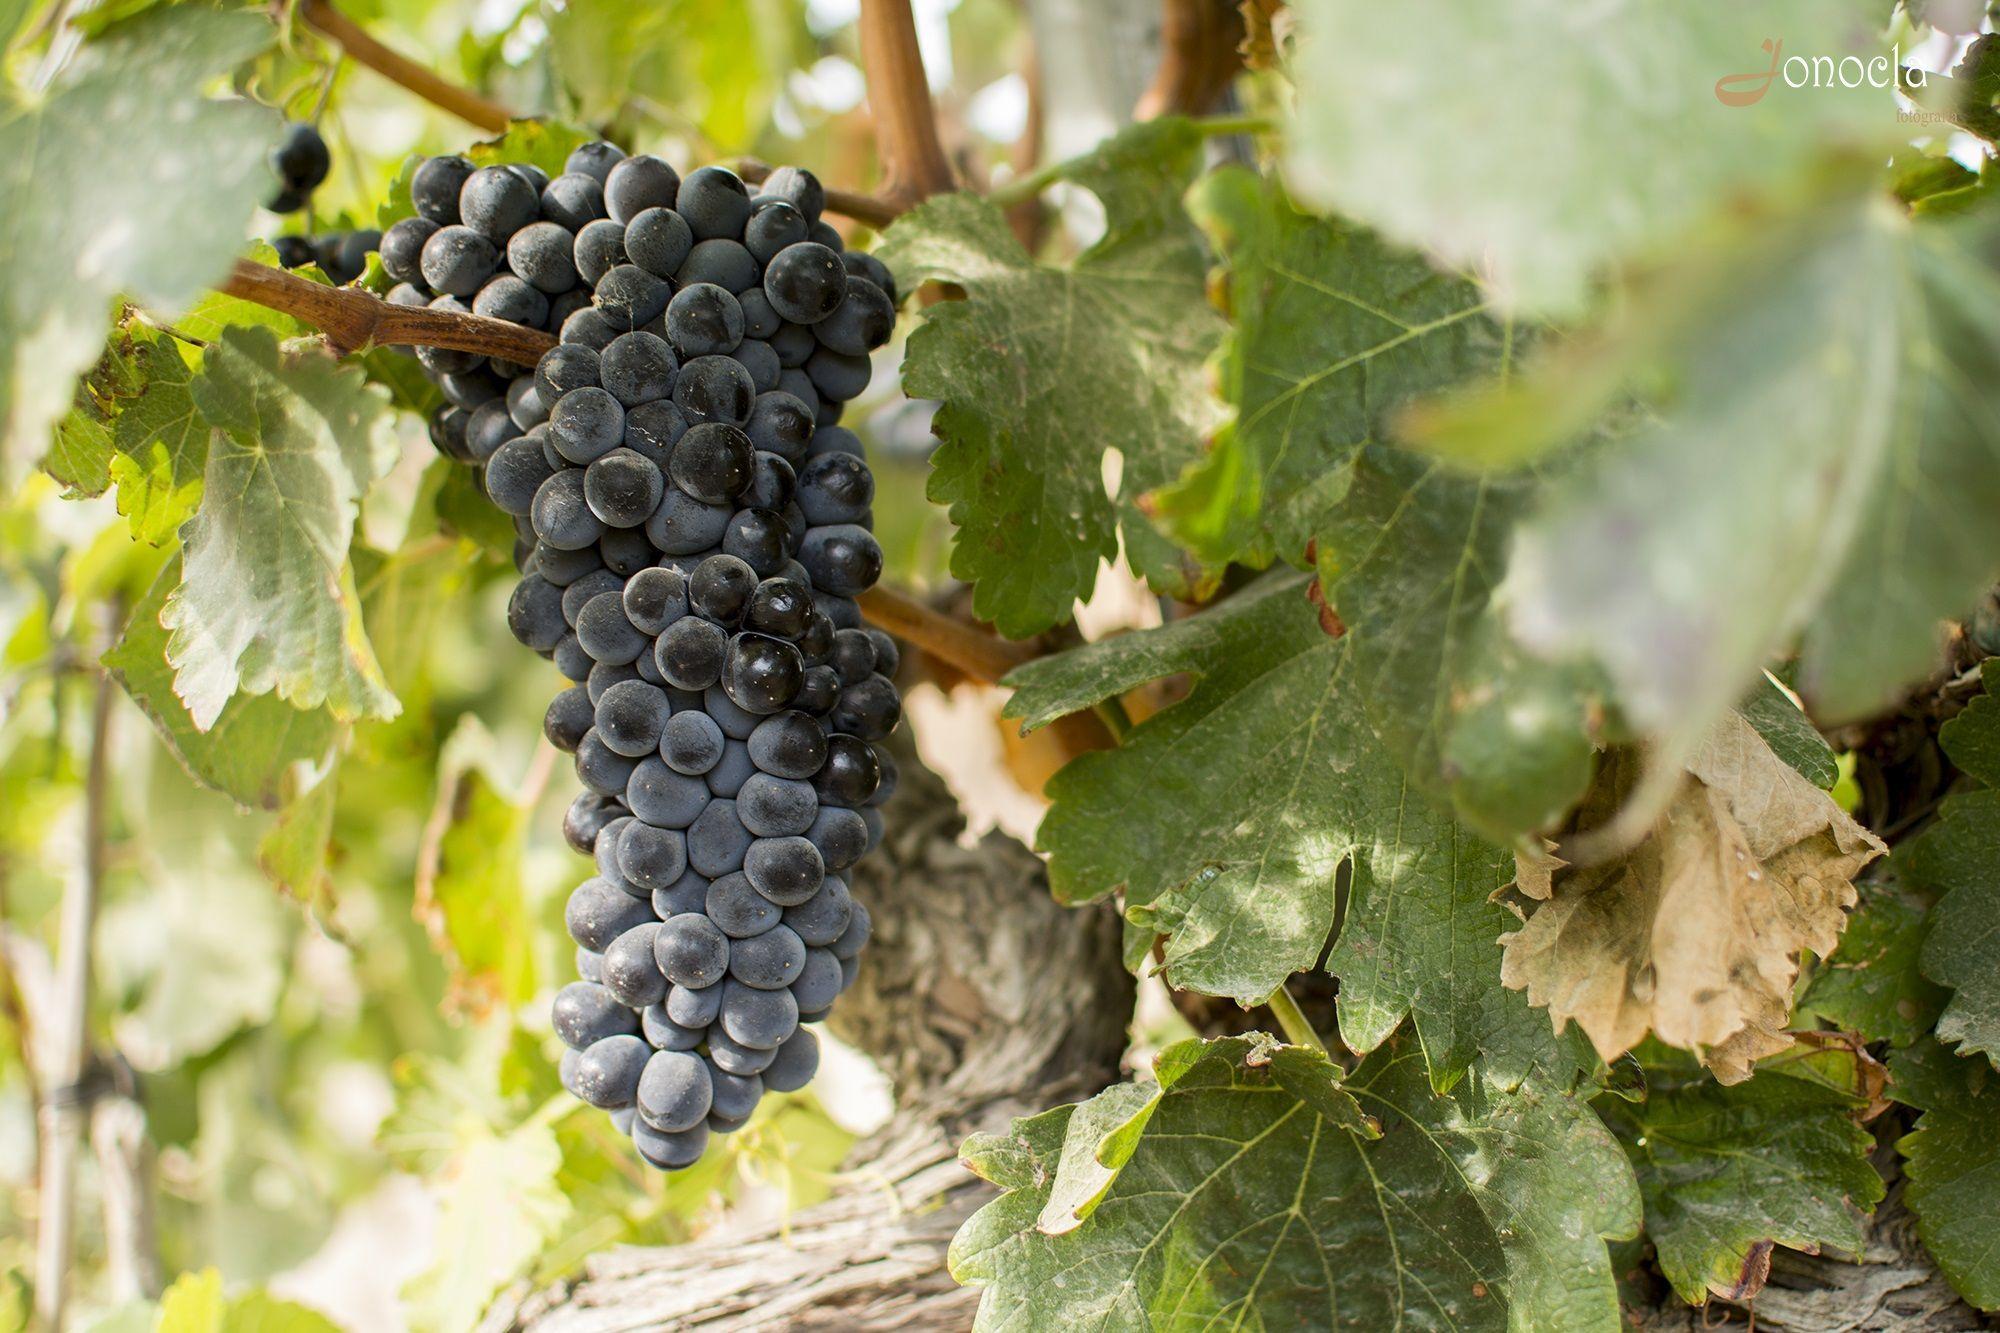 Jonocla uvas 1